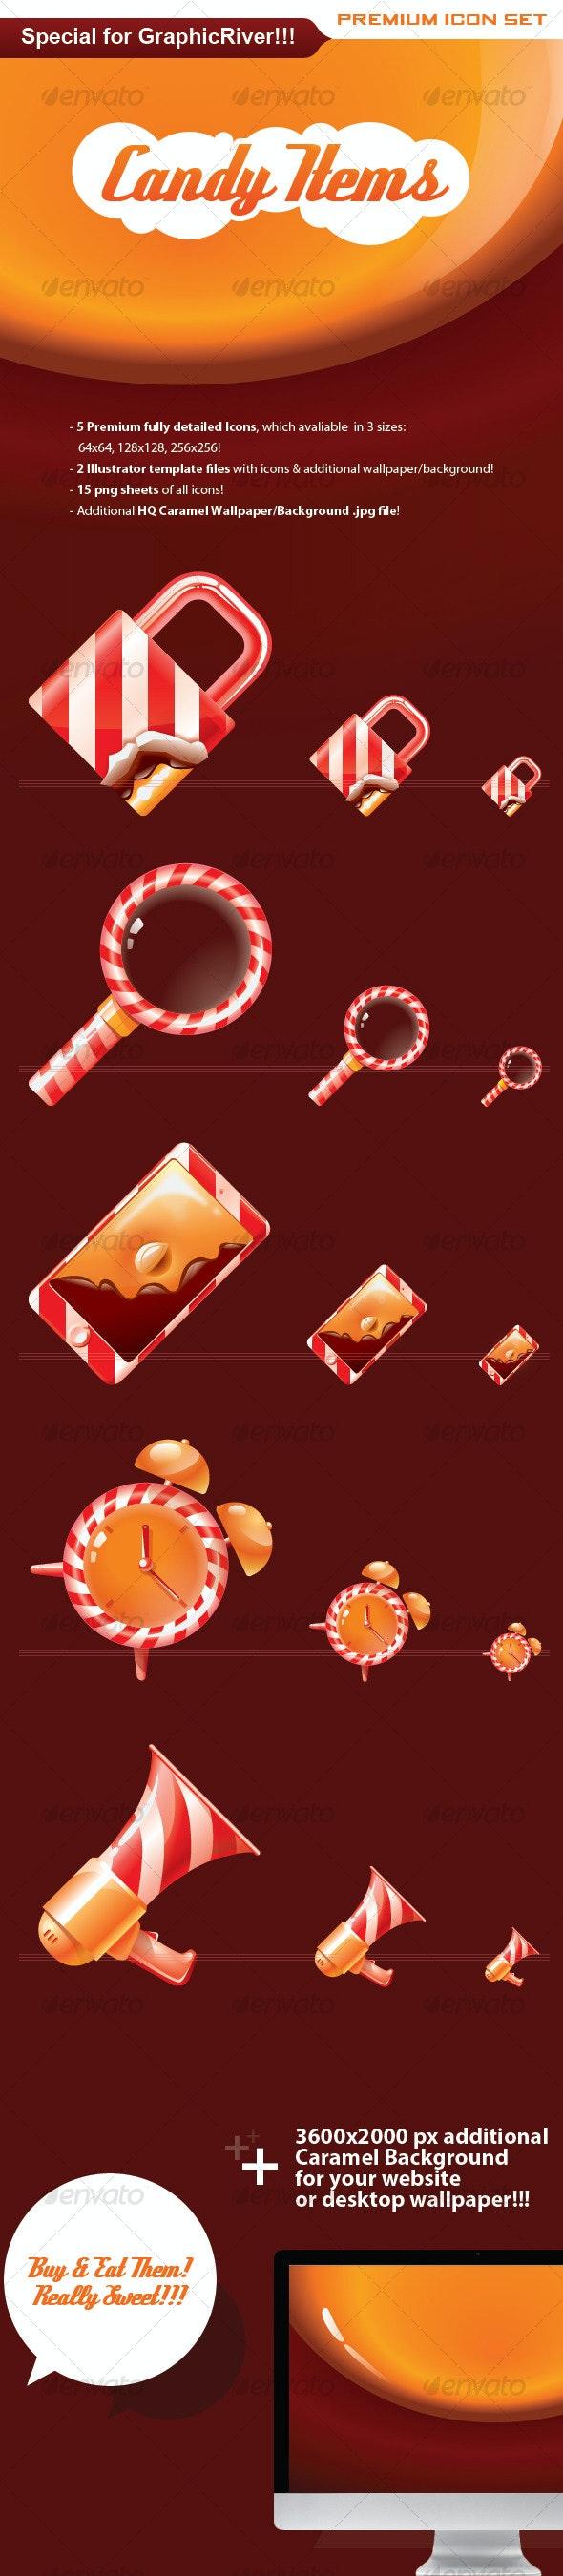 Candy Items - Premium Set. Buy & Eat Them! - Web Icons